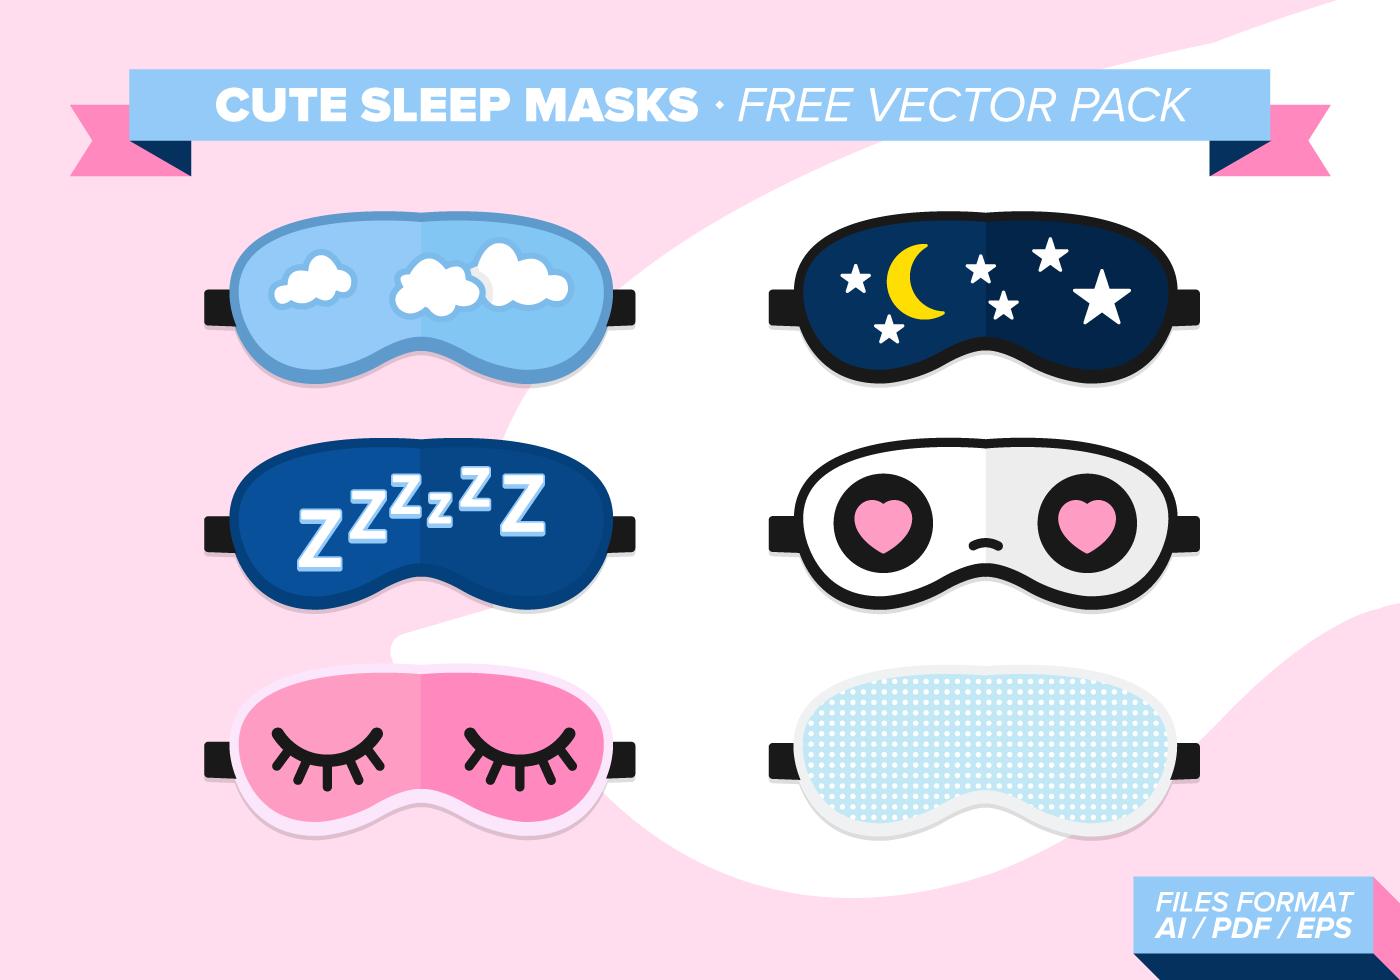 Cute Sleep Masks Free Vector Pack Download Free Vector